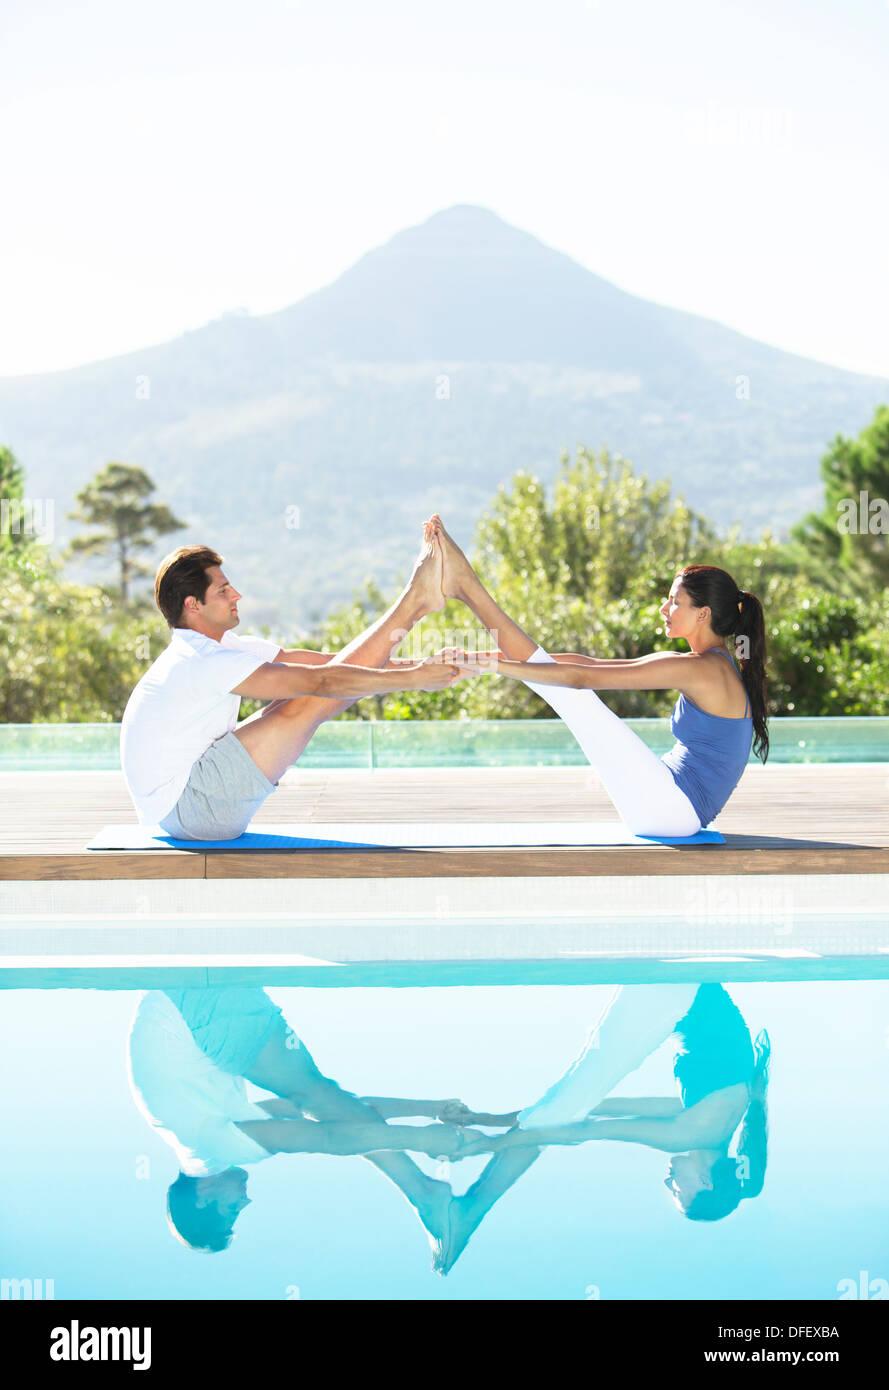 Paar üben Yoga am Pool Stockfoto